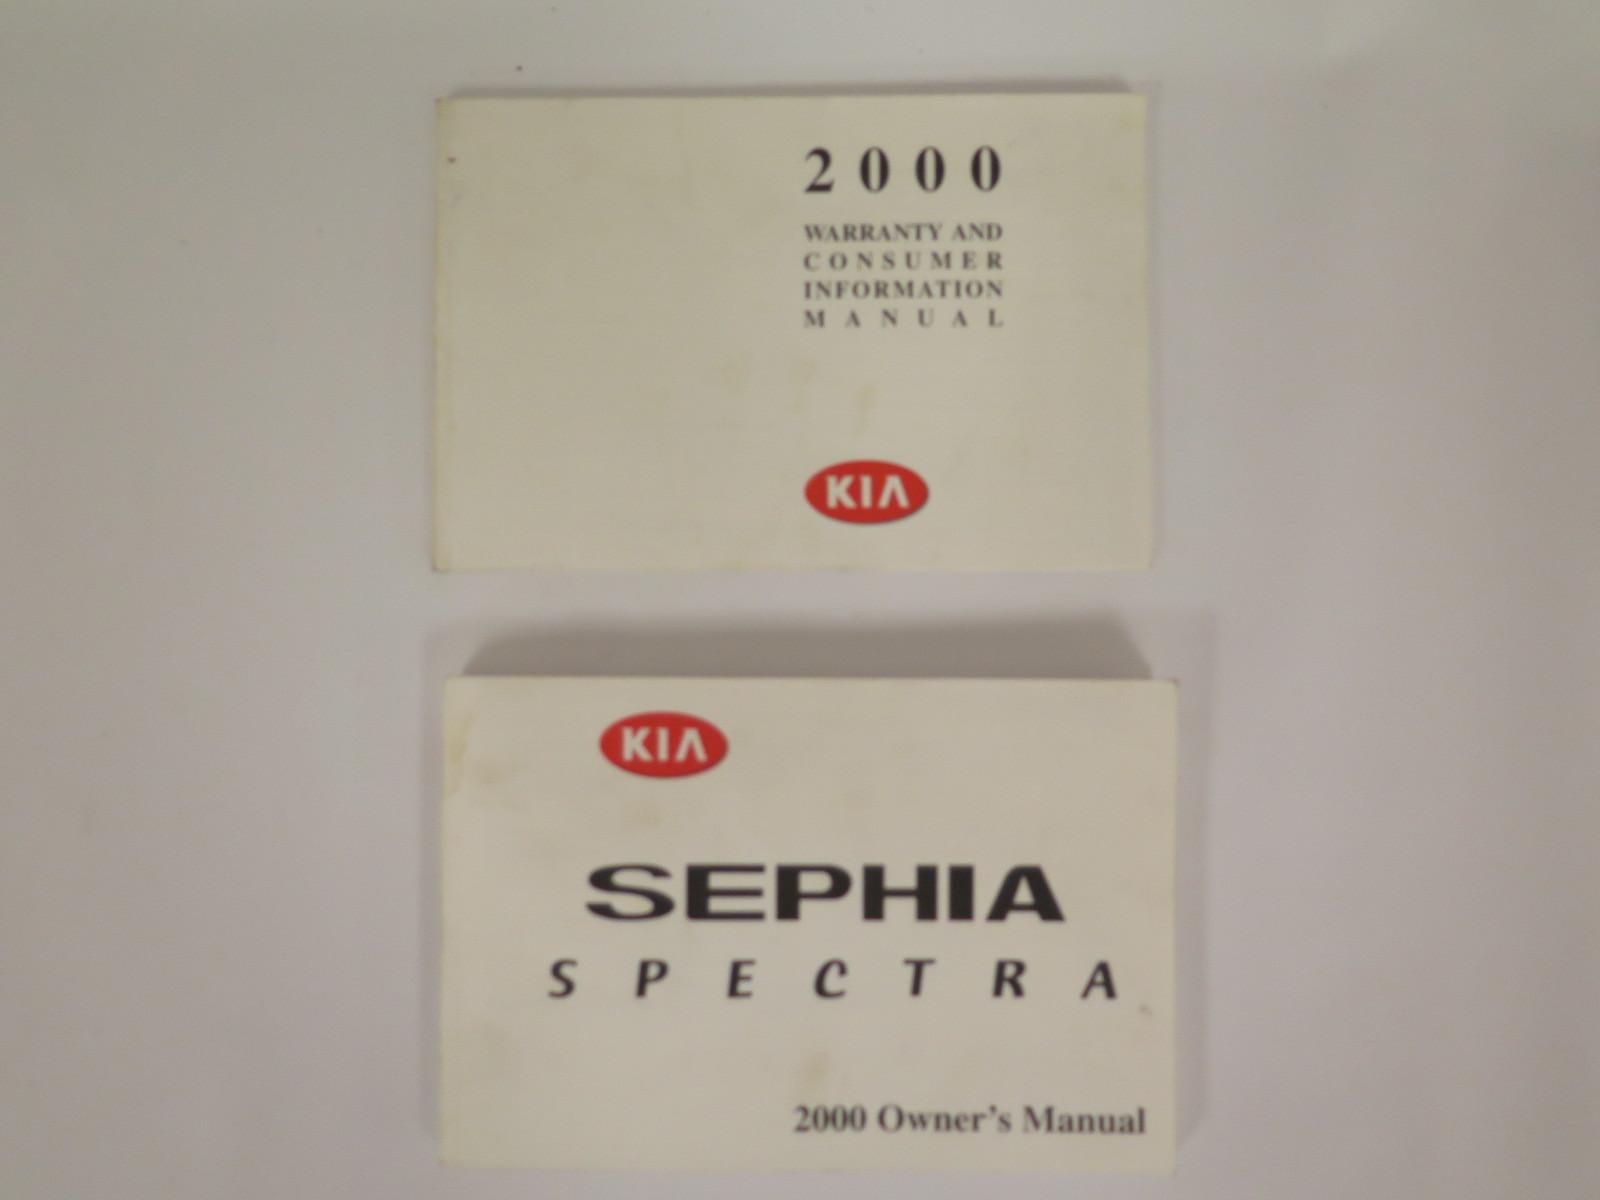 2000 kia sephia spectra owners manual book bashful yak rh bashfulyak com Kia Sorento 2000 Kia Sephia MPG